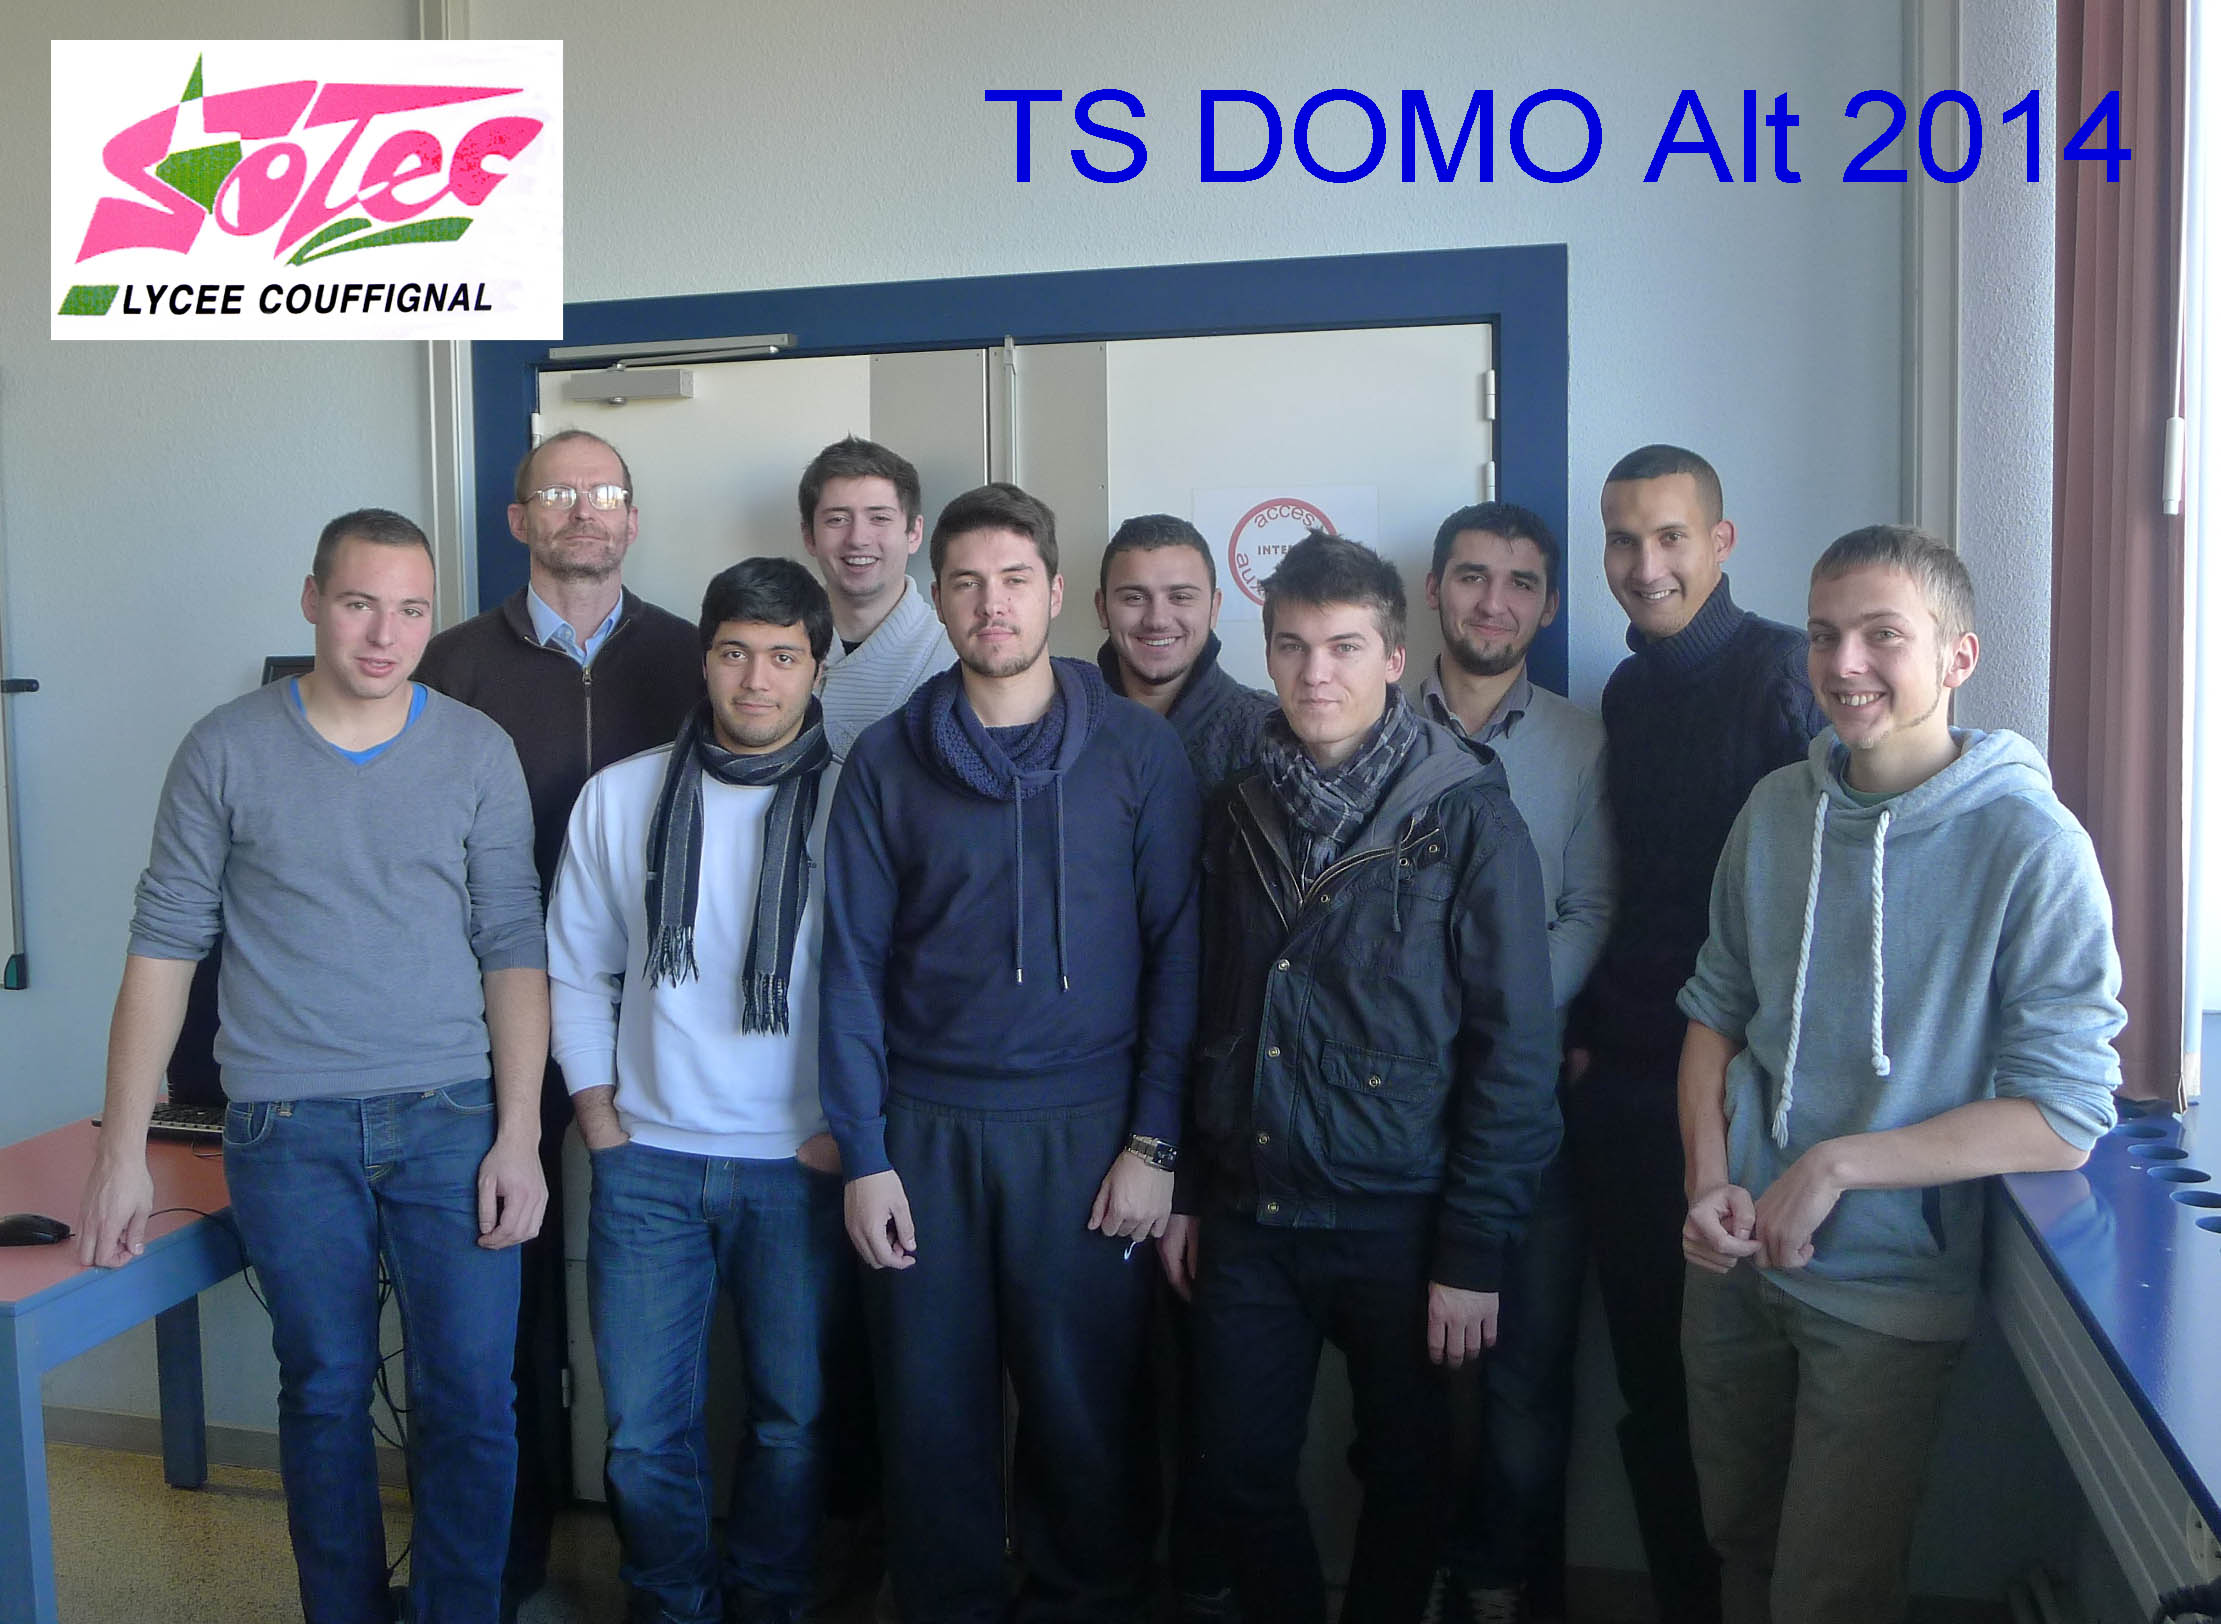 2014_DOMO_Alt.jpg